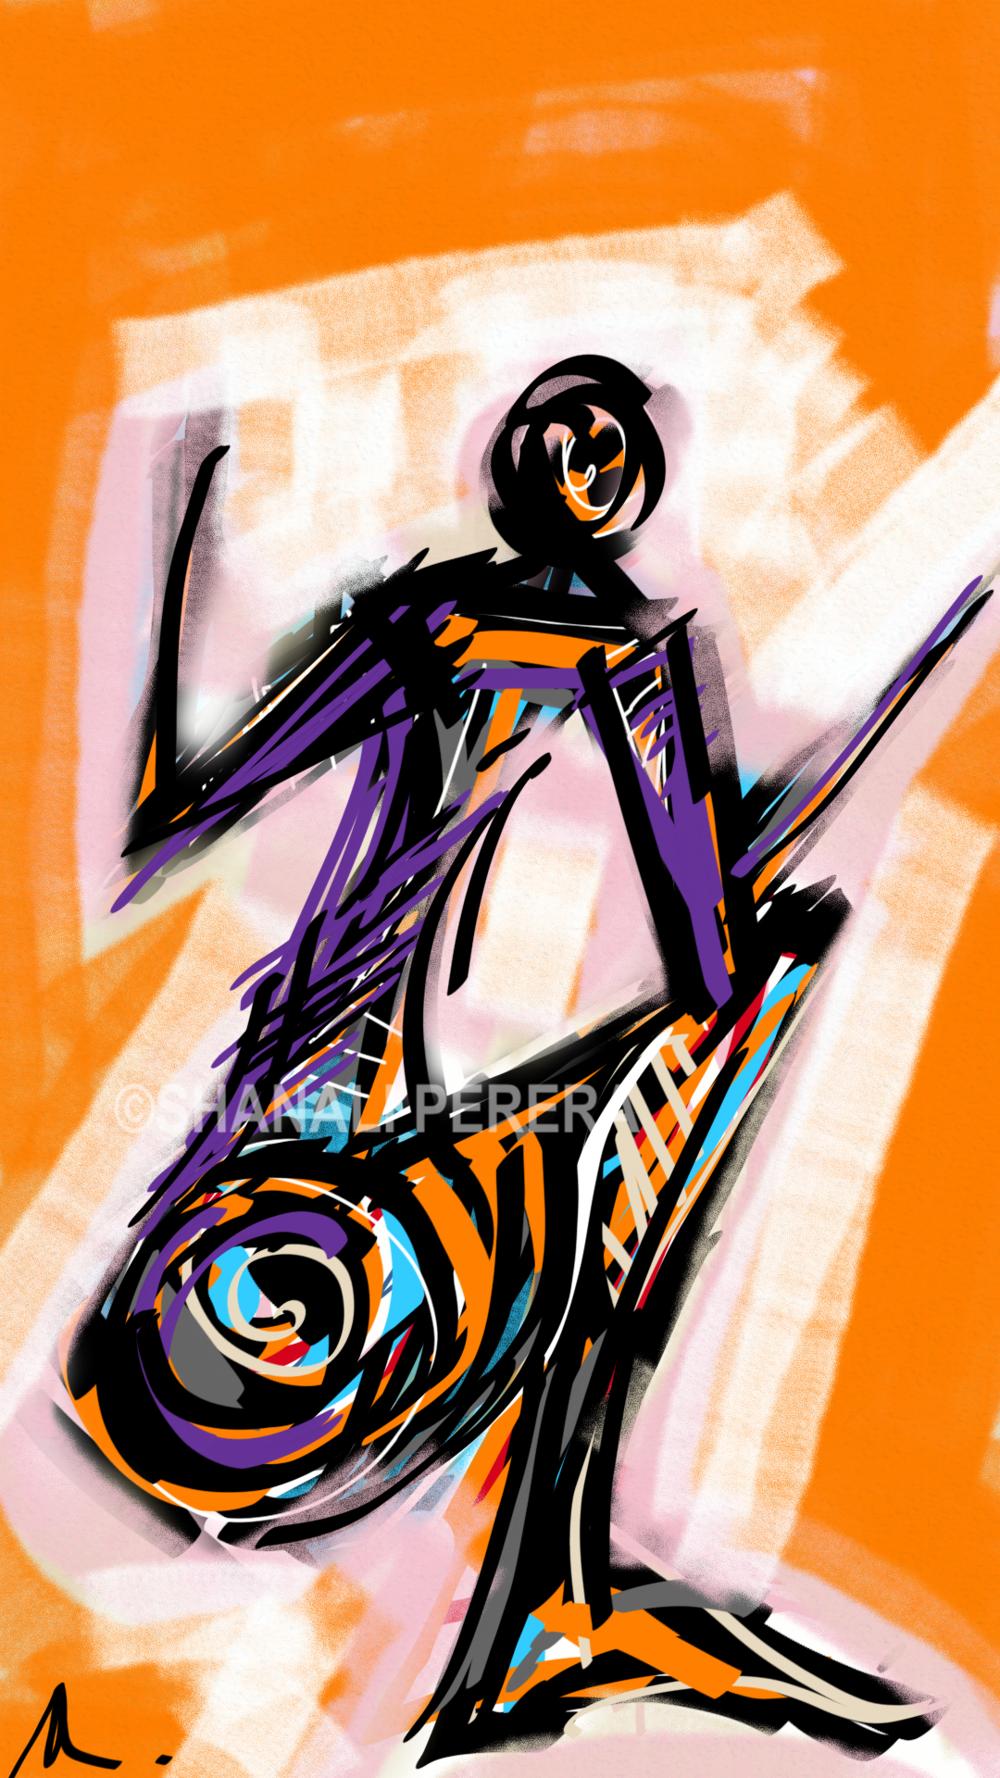 sketch-1522436542908.png